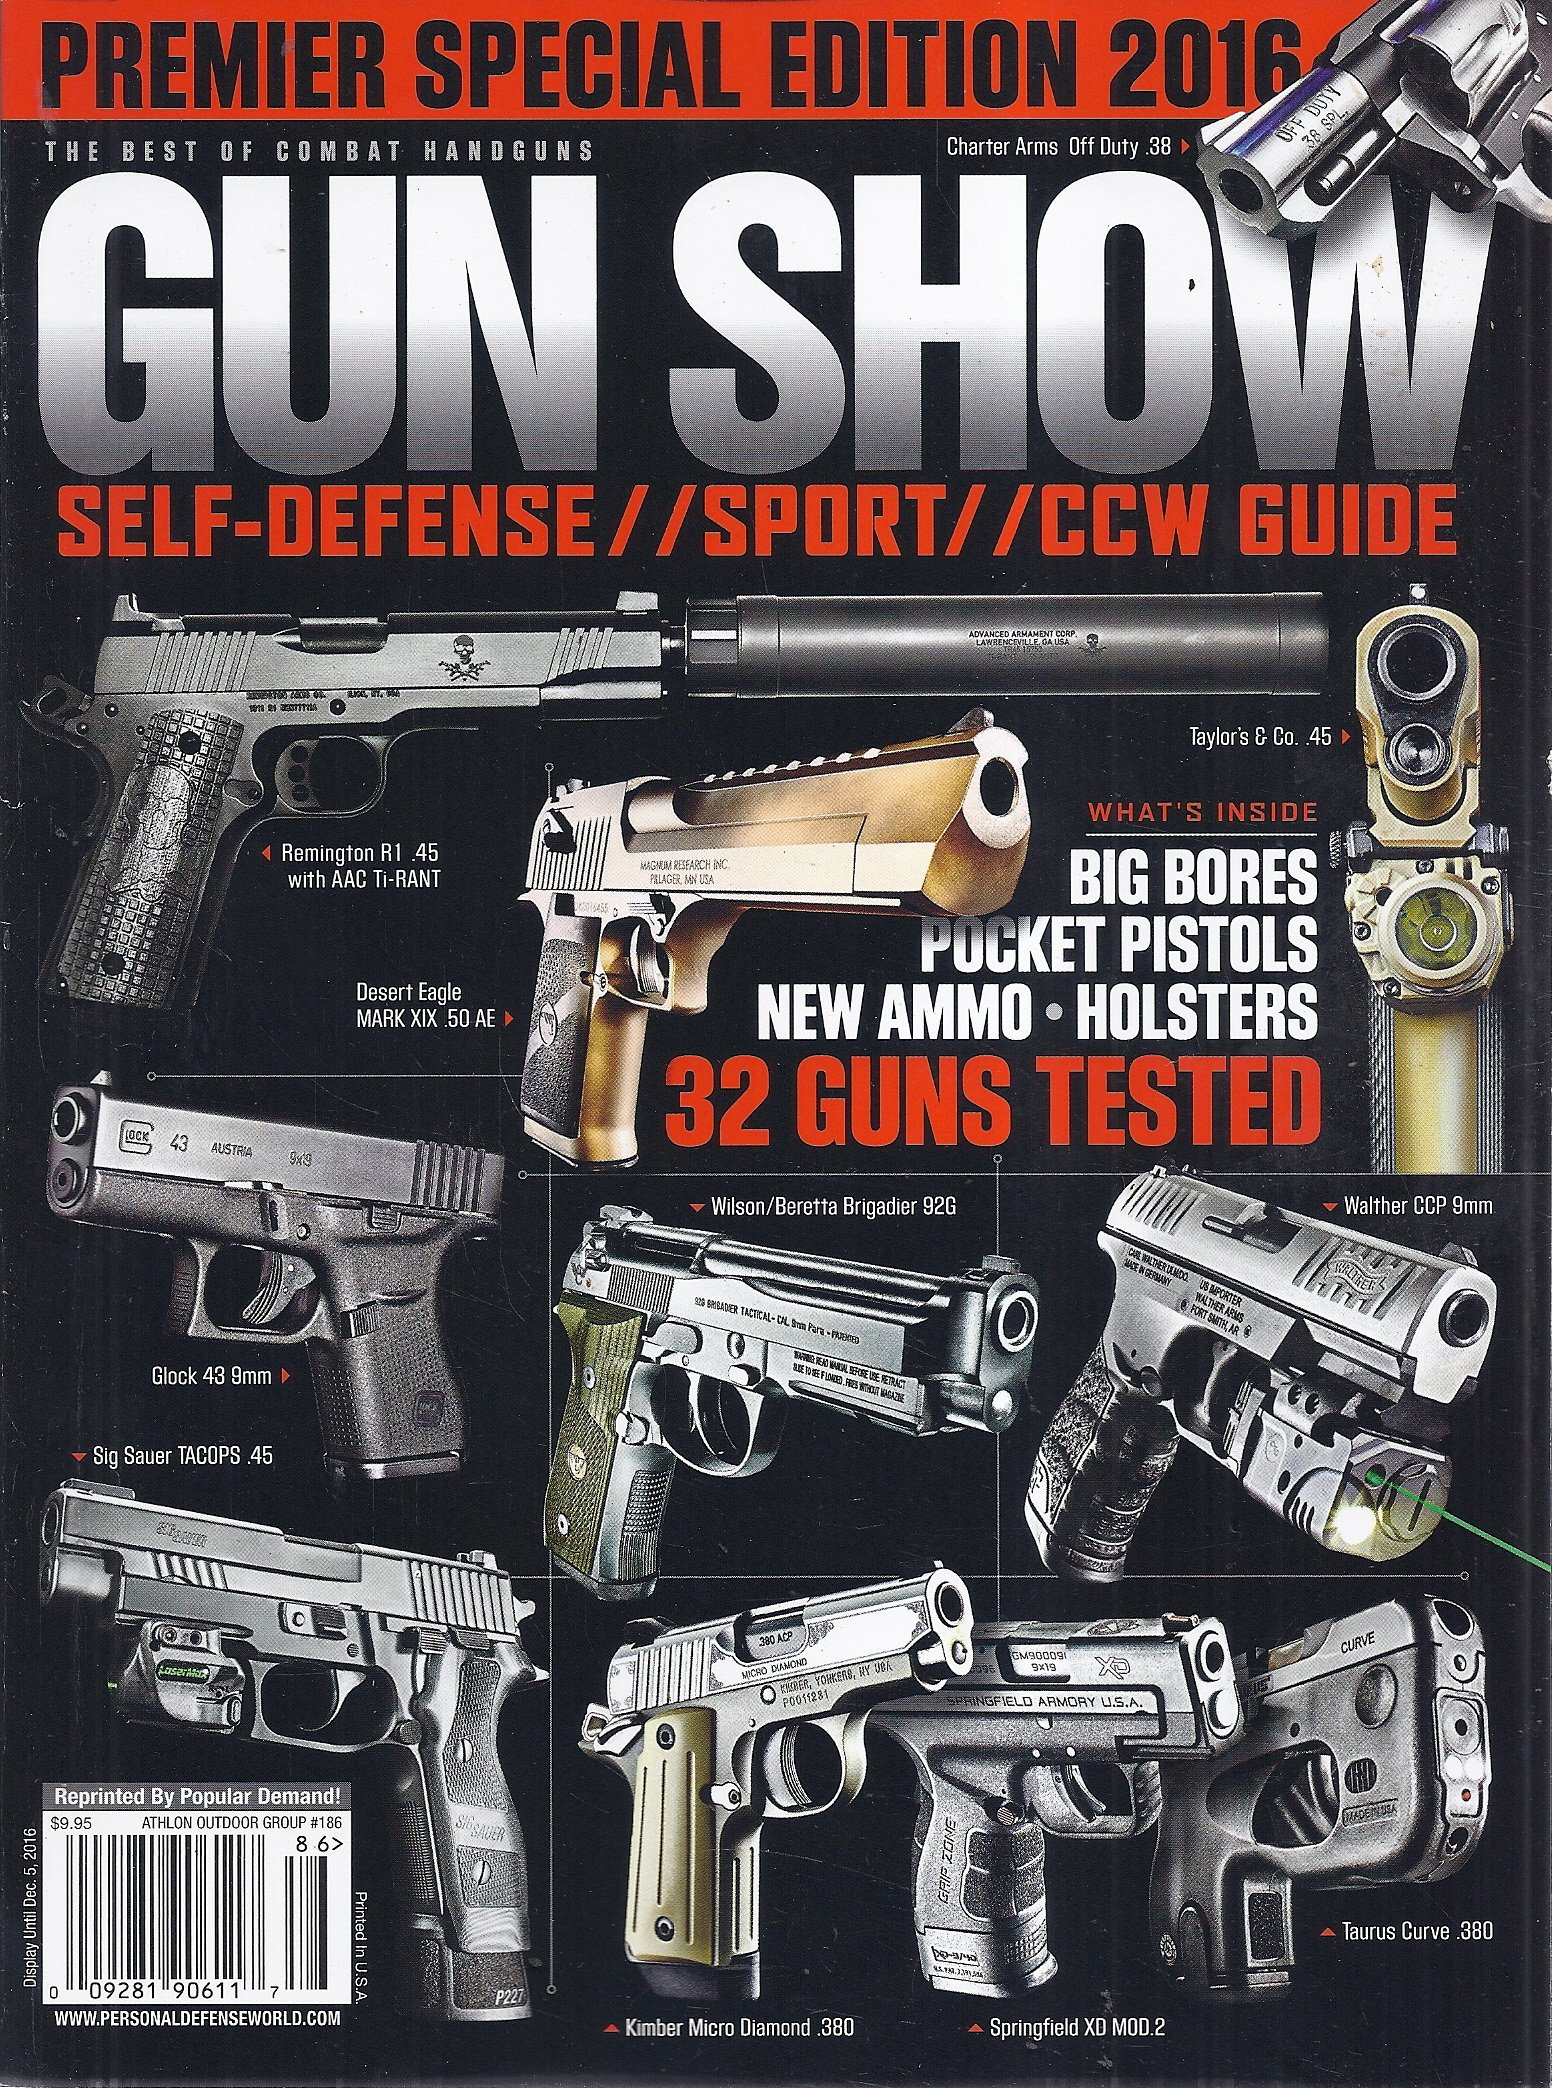 The Best of Combat Handguns Magazine (Premier Special